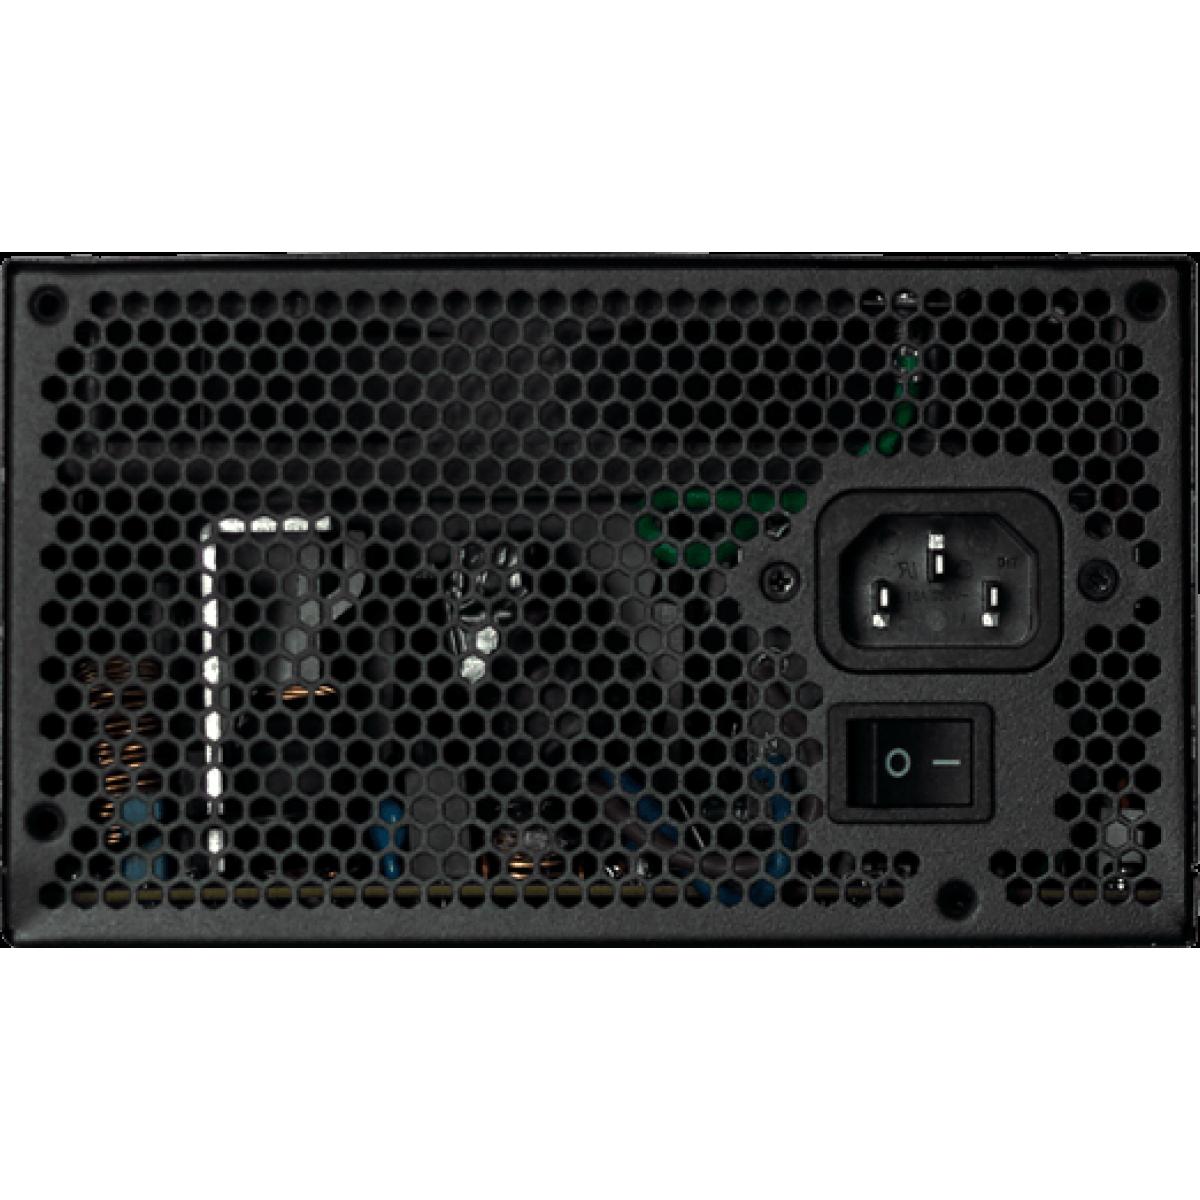 Fonte Riotoro Builder Edition 500W, 80 Plus White, PFC Ativo, PR-BFX500-NA